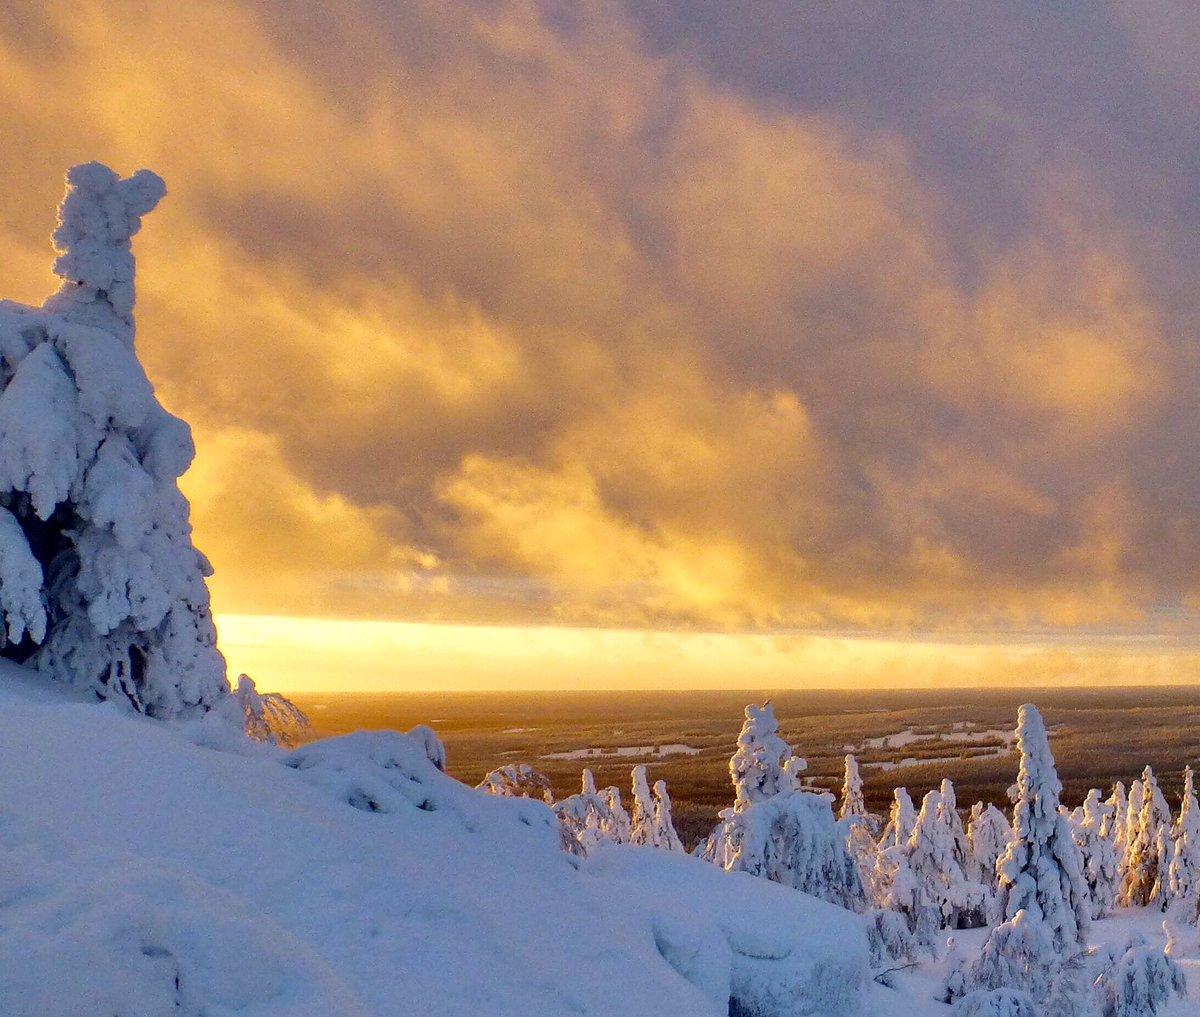 Check Lapland #itineries at  https:// diytrips.tips  &nbsp;   #WinterWonderland #Travel #wanderlust #traveldiaries #travelblogger #digitalnomads #Tips<br>http://pic.twitter.com/7mJkRyV1ug